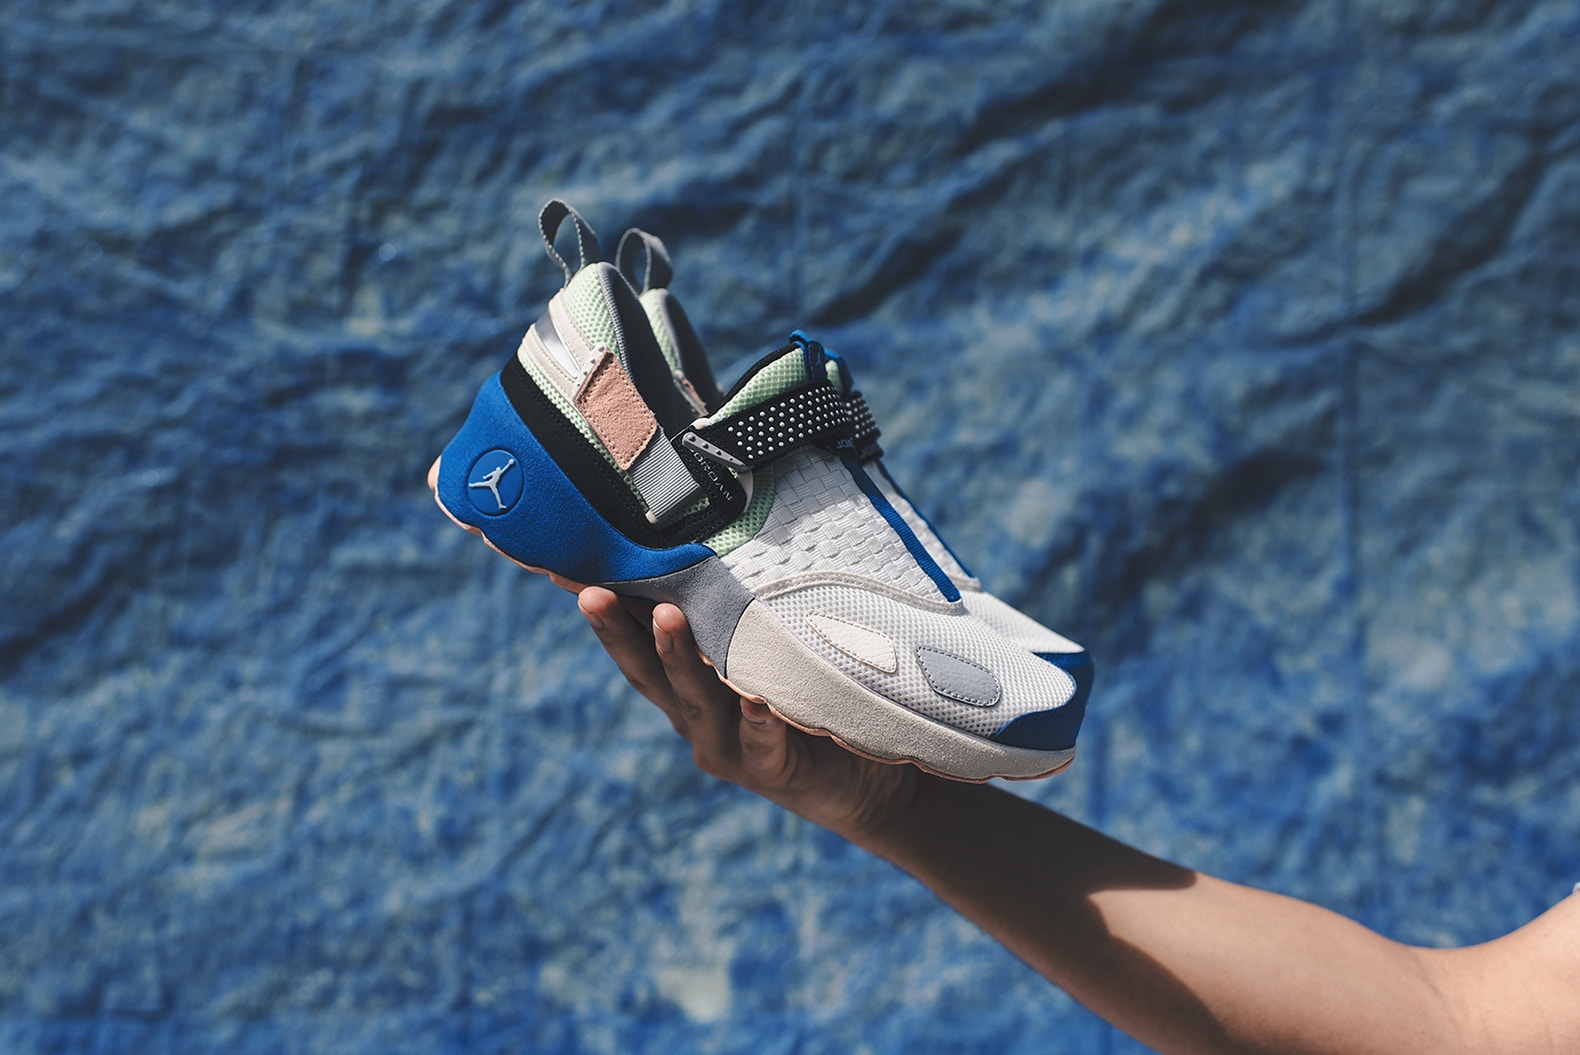 Images Of The Travis Scott Jordan Trunner LX Cactus Jack Sneaker